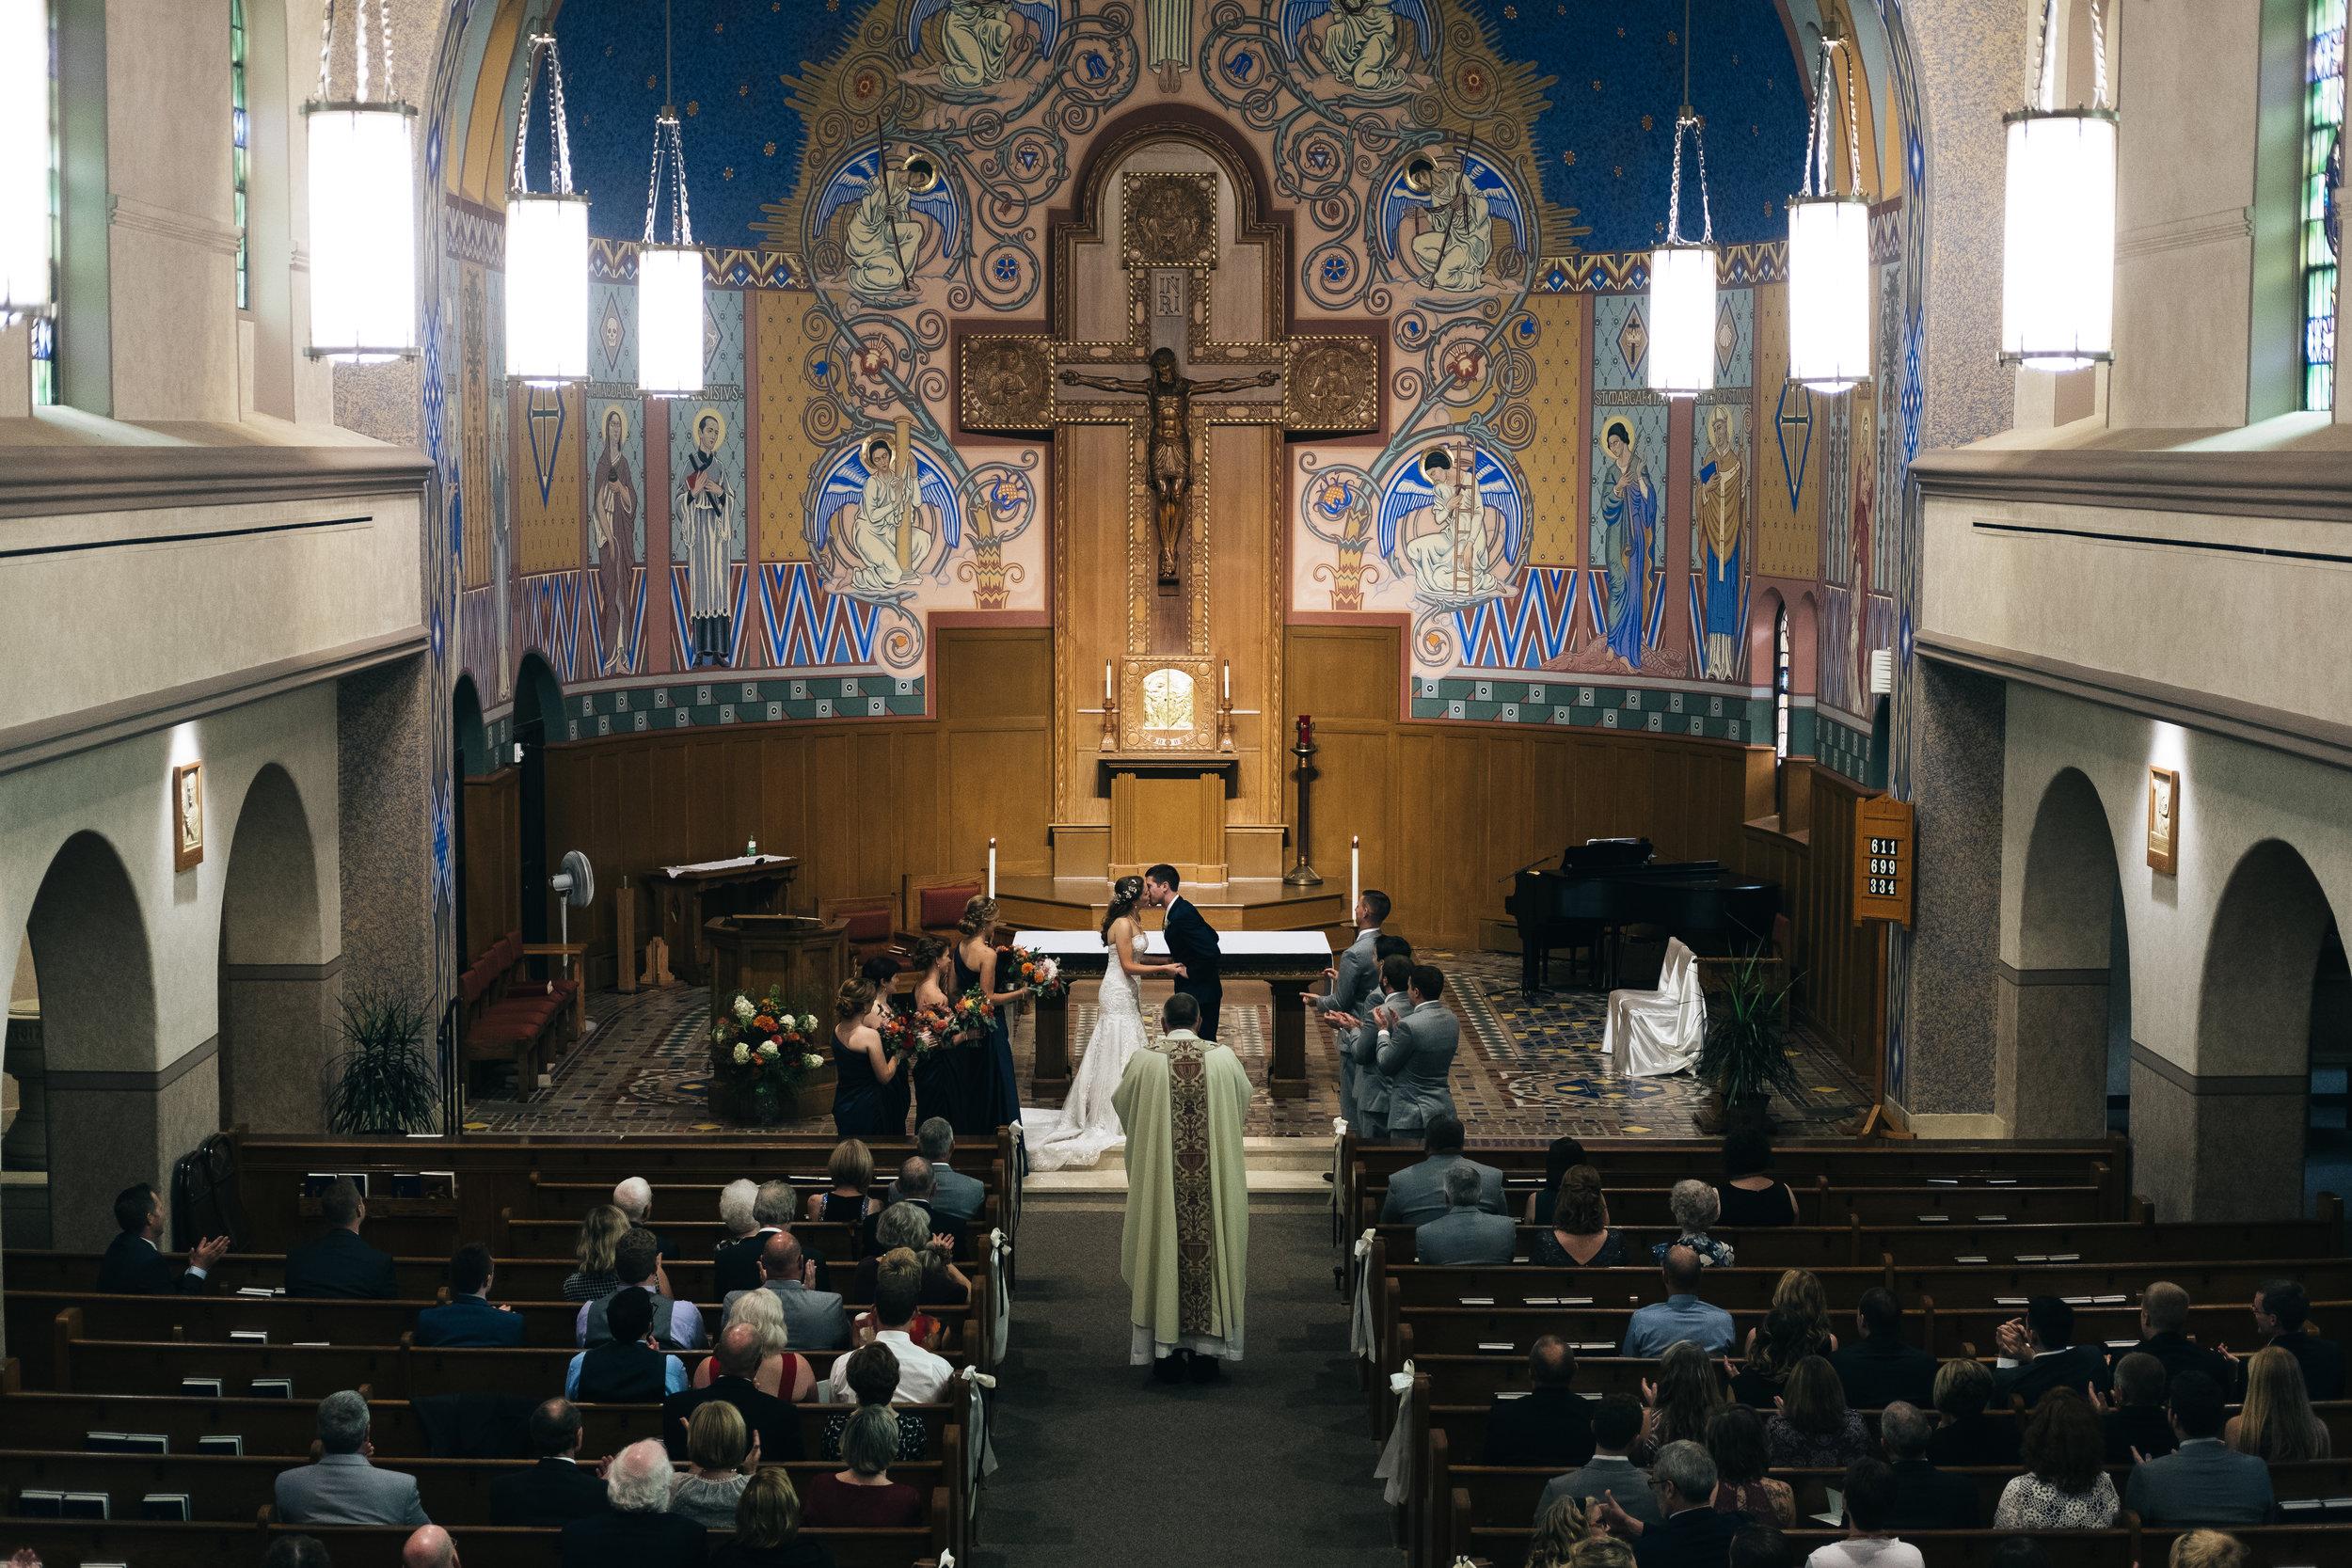 Wedding ceremony at St.Aloysius Catholic Church in Bowling Green, Ohio.